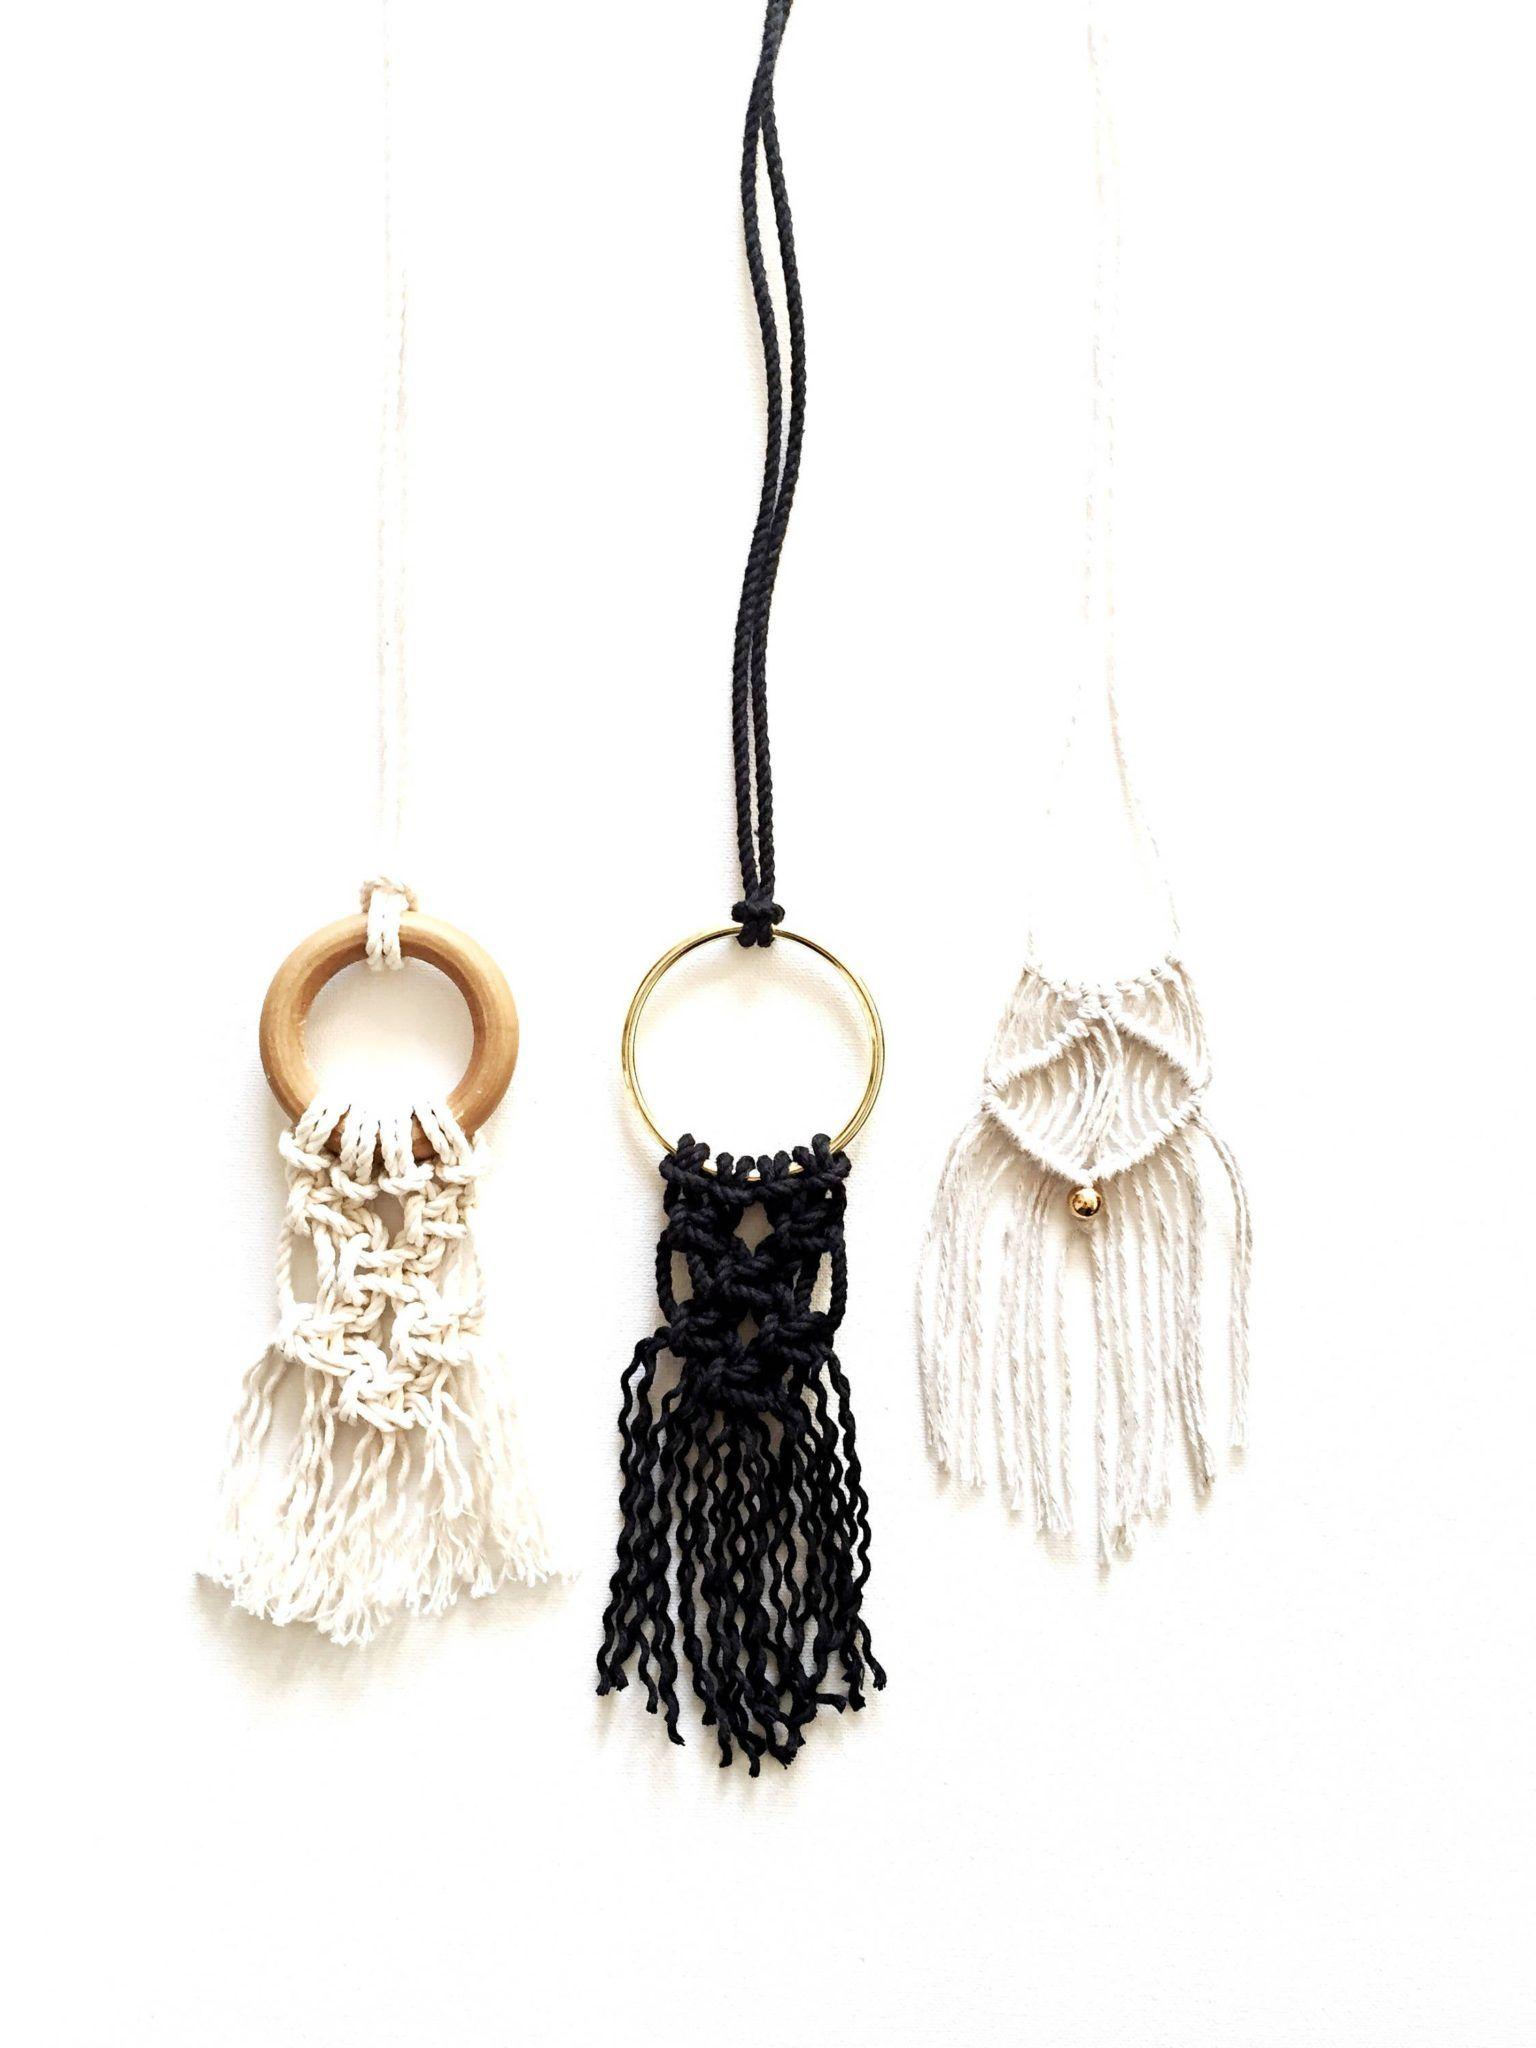 Diy macrame kits in 2020 macrame diy necklace kits macrame